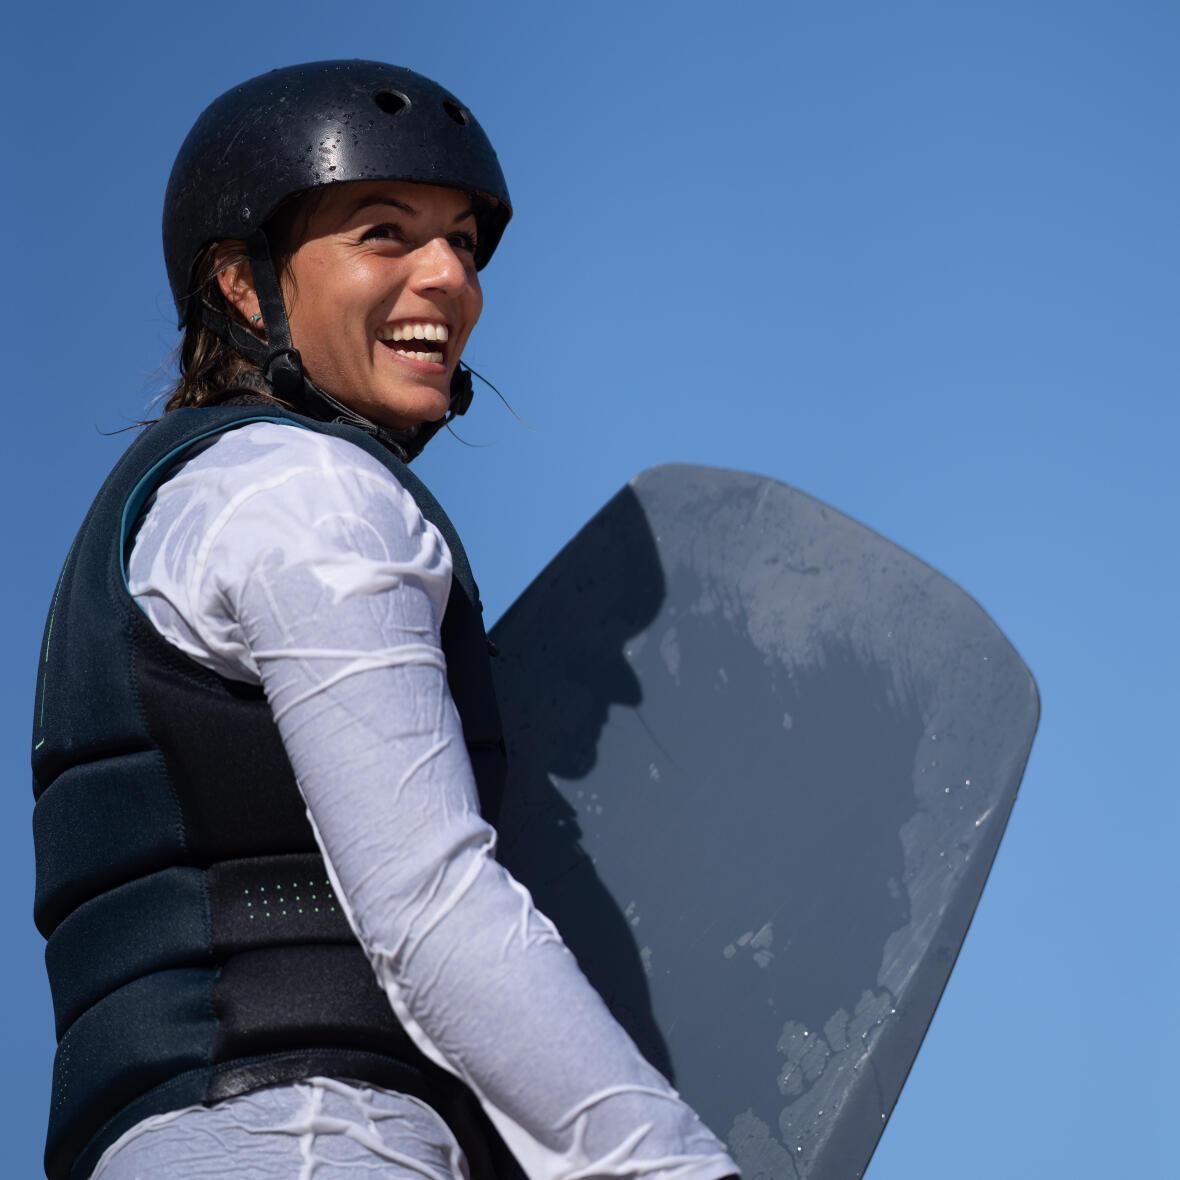 wakeboard fille Davina Deruben